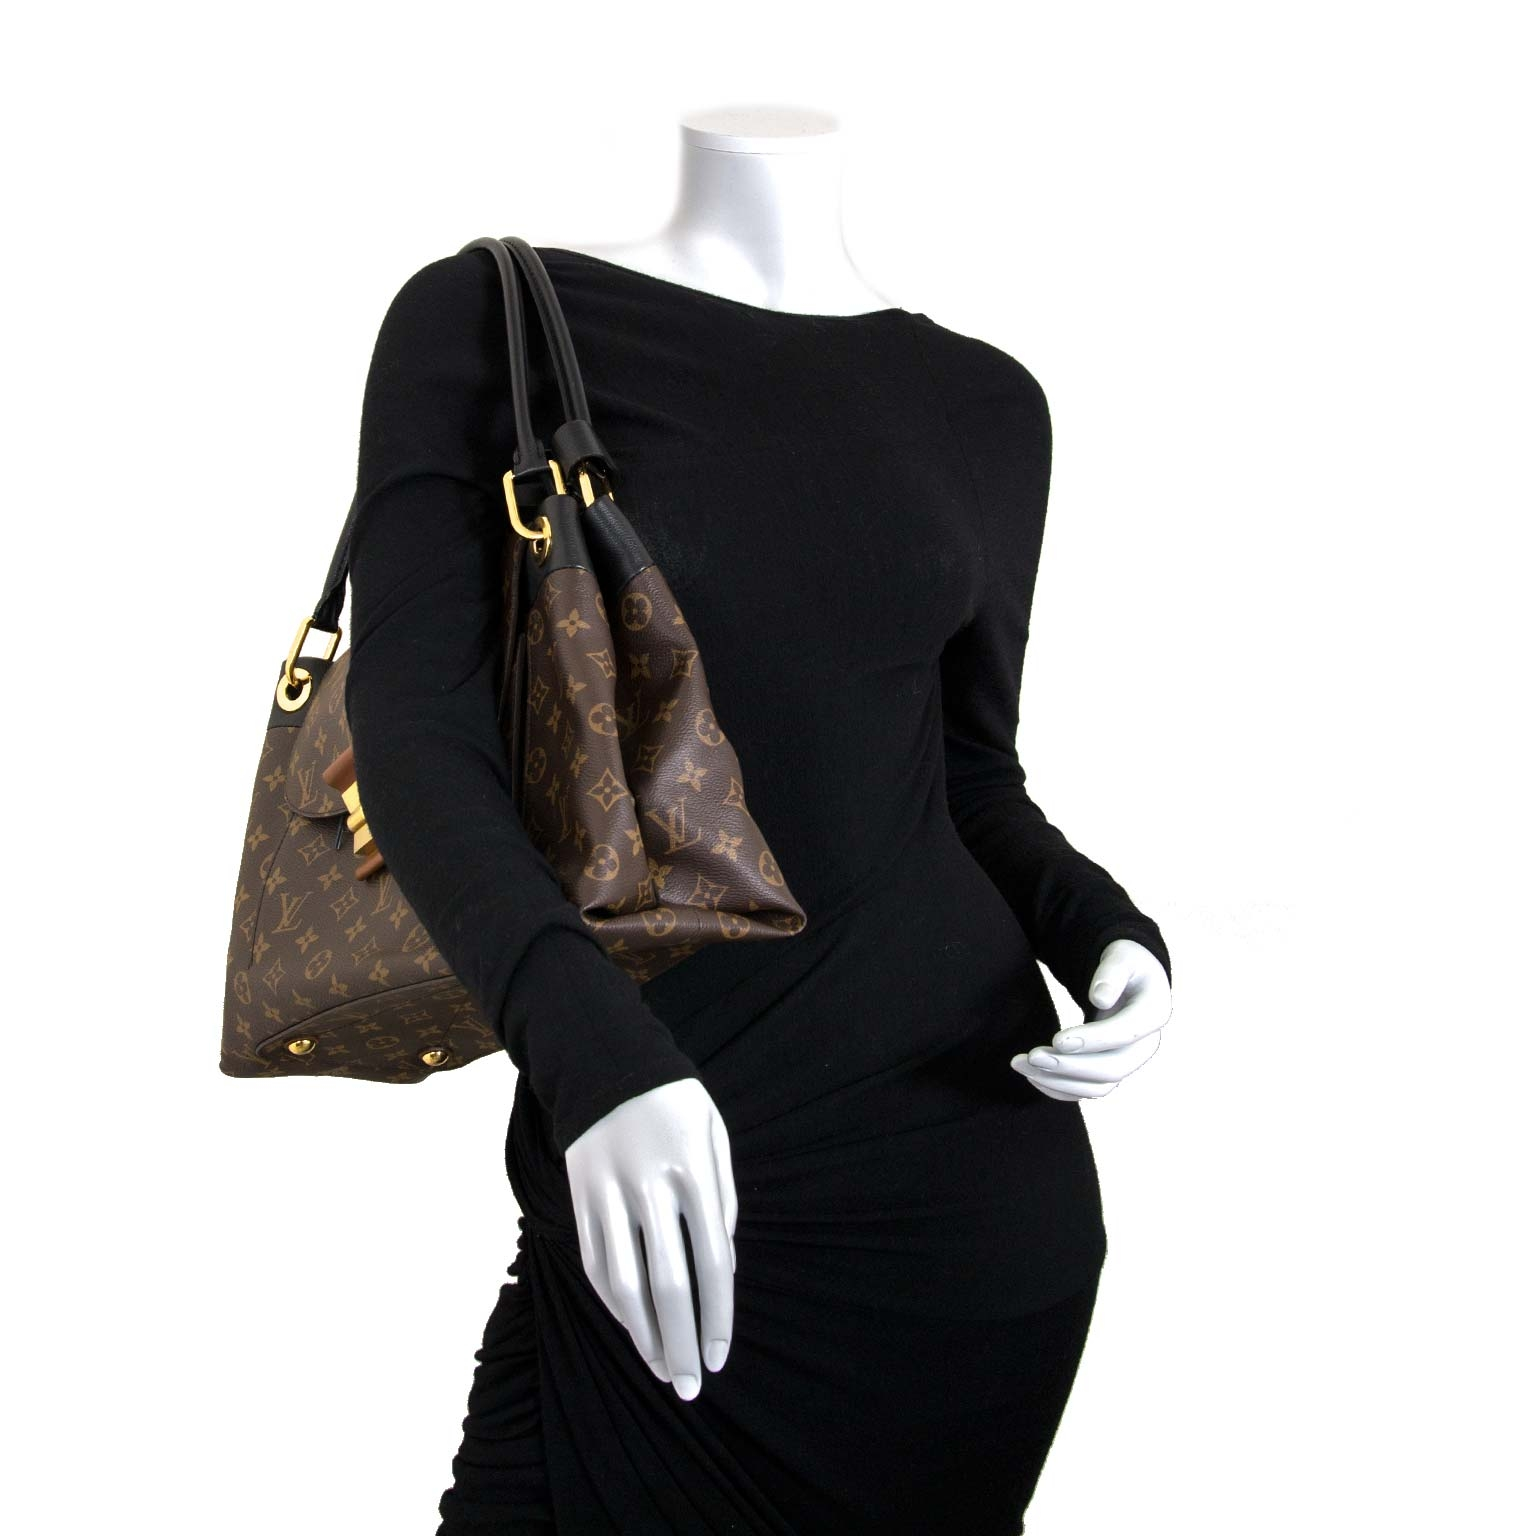 916a0b865afc ... louis vuitton monogram olympia bag now for sale at labellov vintage  fashion webshop belgium